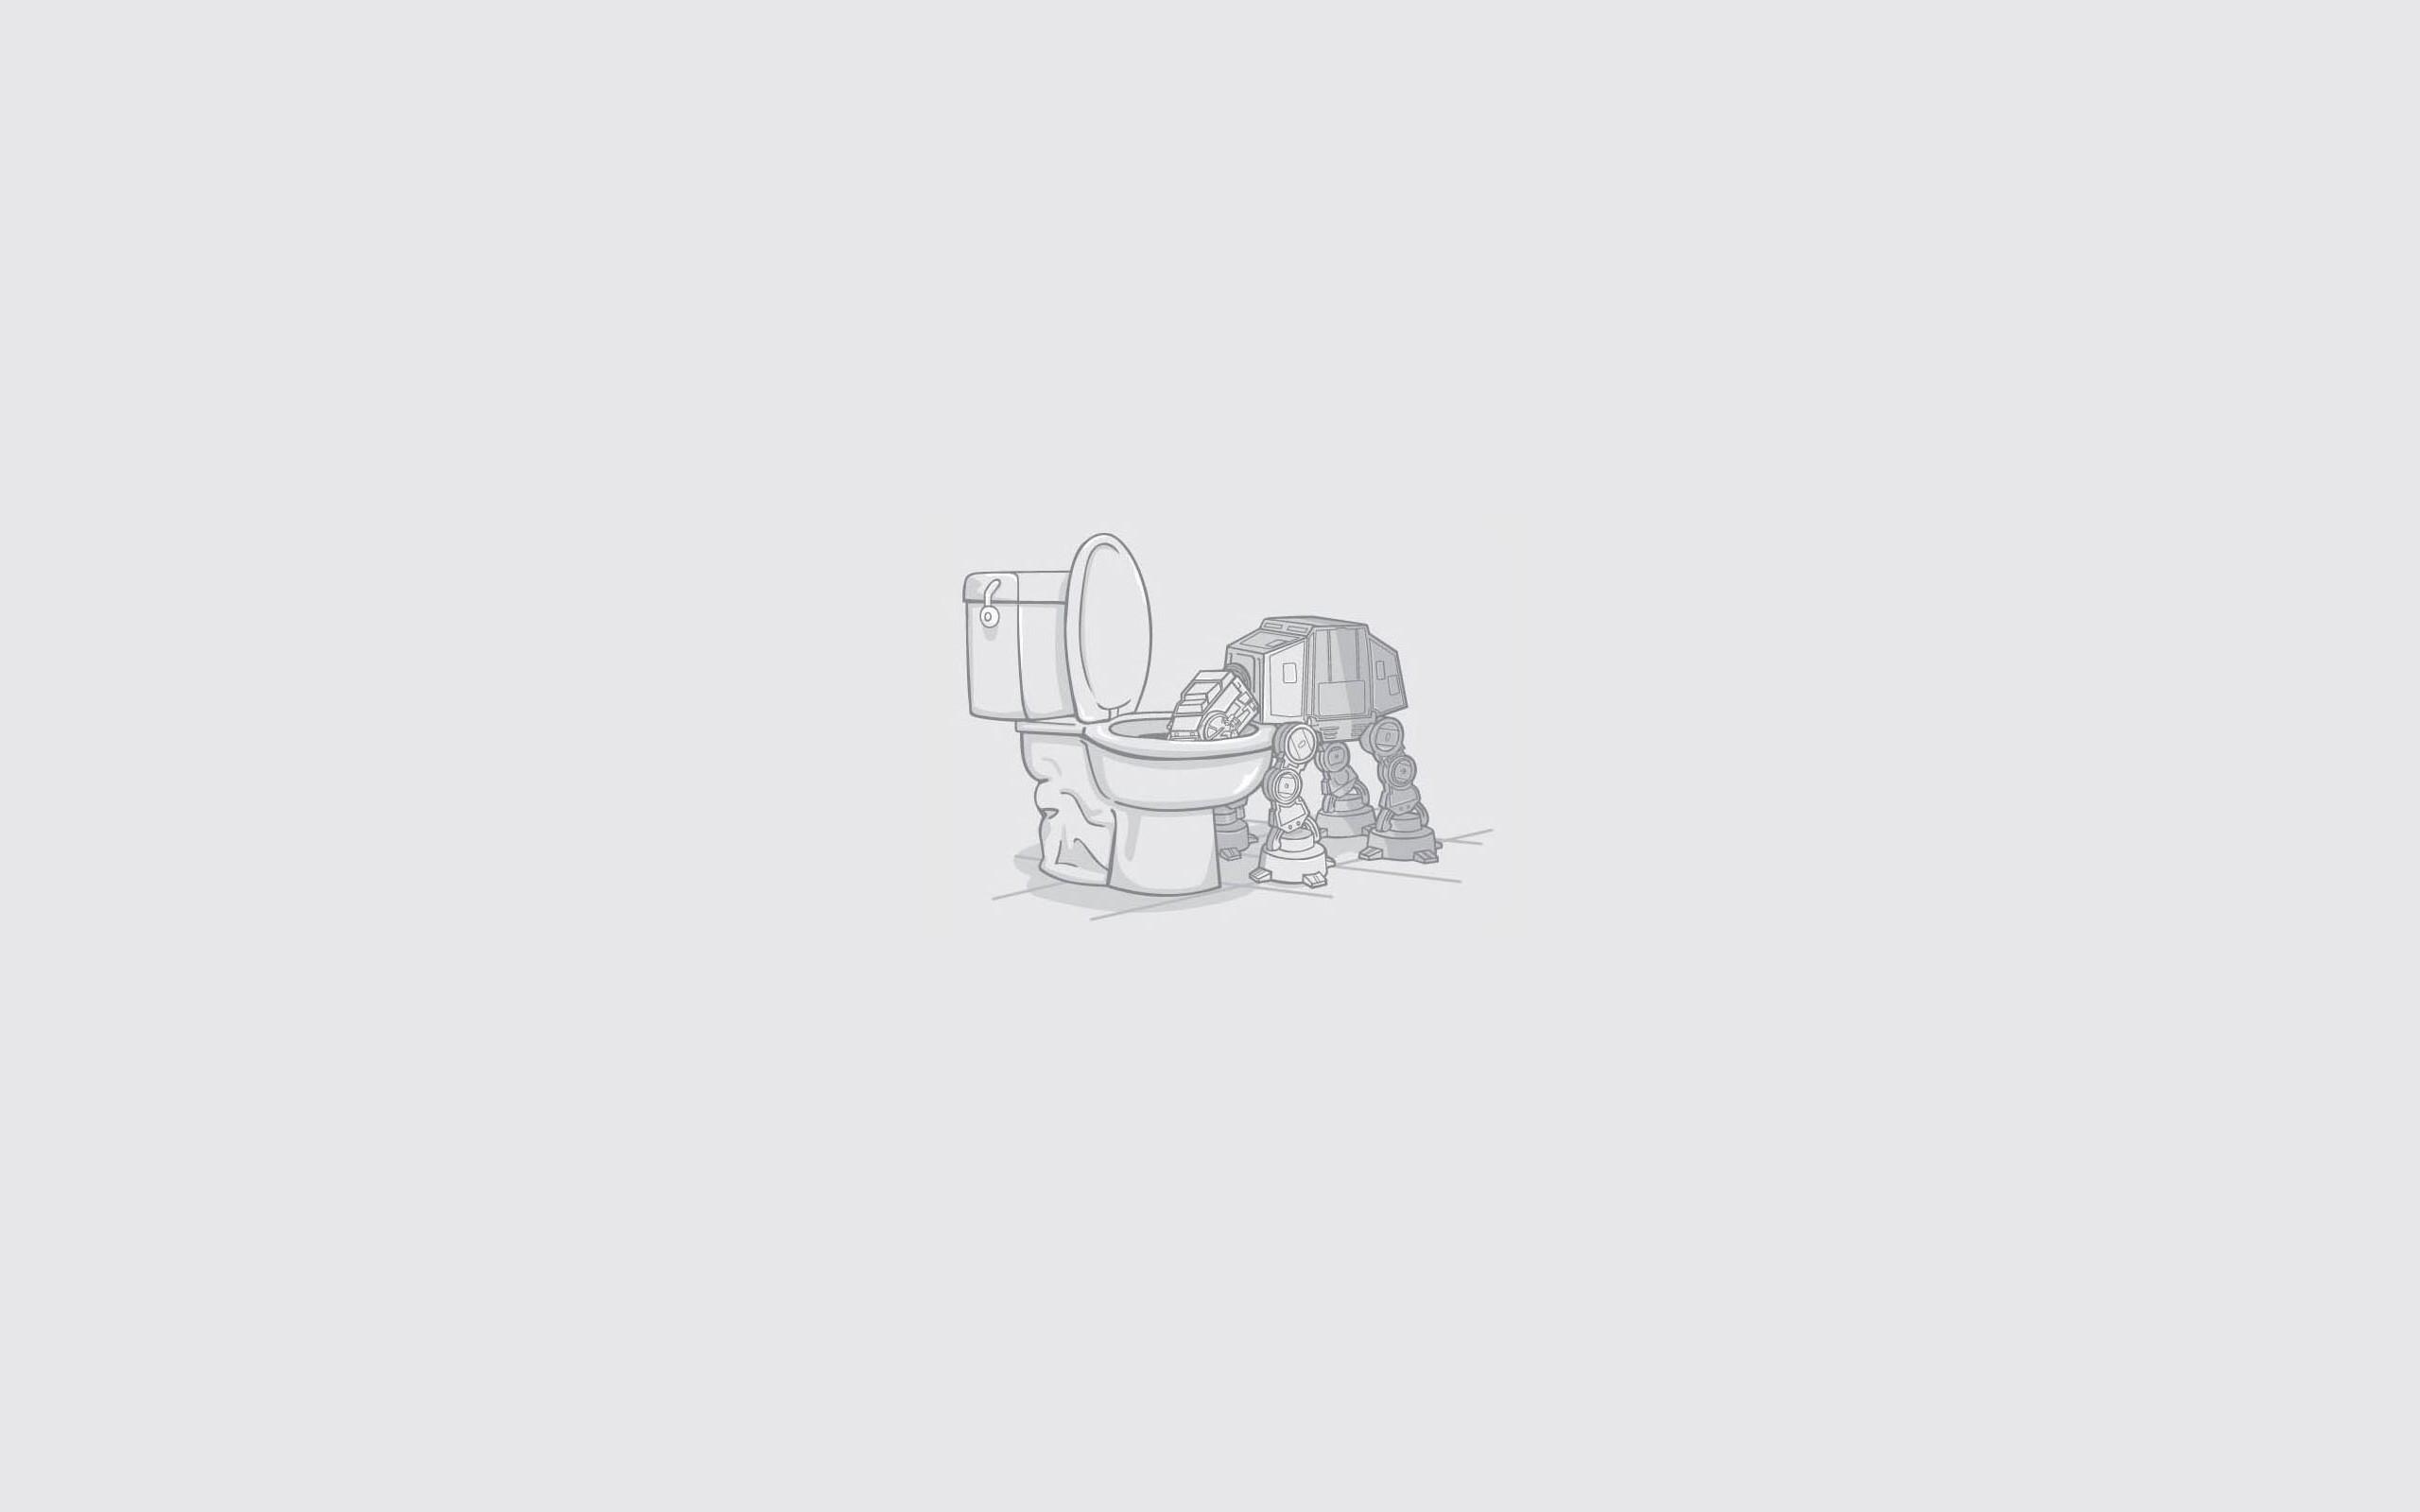 Wallpaper Drawing Star Wars Minimalism Artwork Text Logo